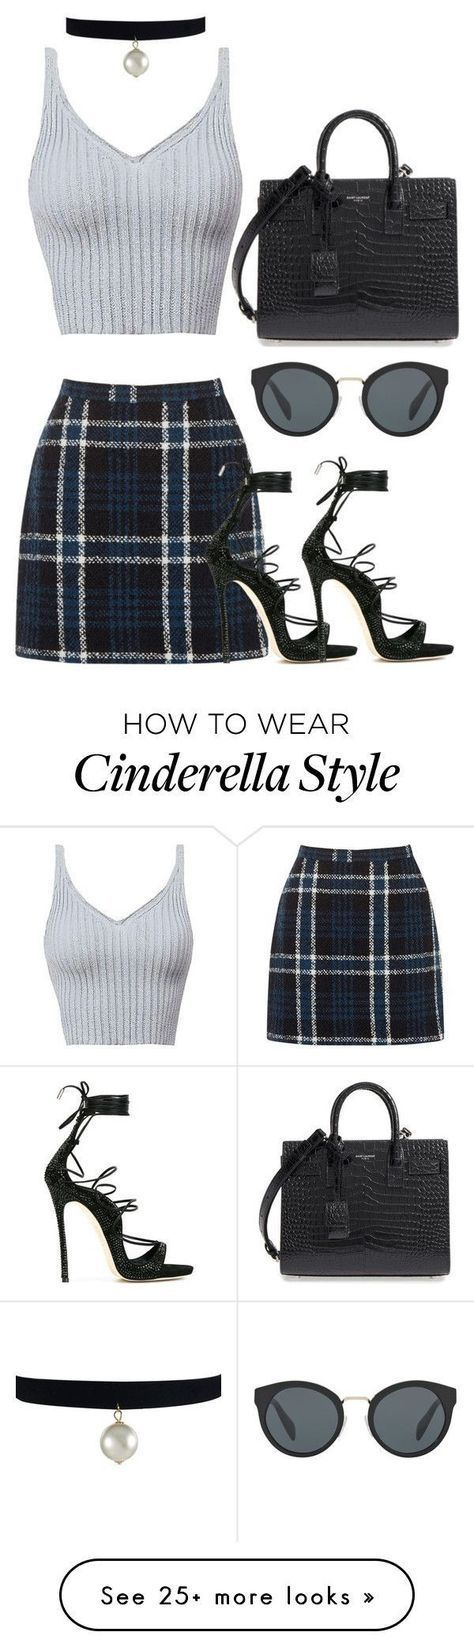 Skirt plaid outfit winter grunge 26 Ideas #wintergrunge Skirt plaid outfit winter grunge 26 Ideas #wintergrunge